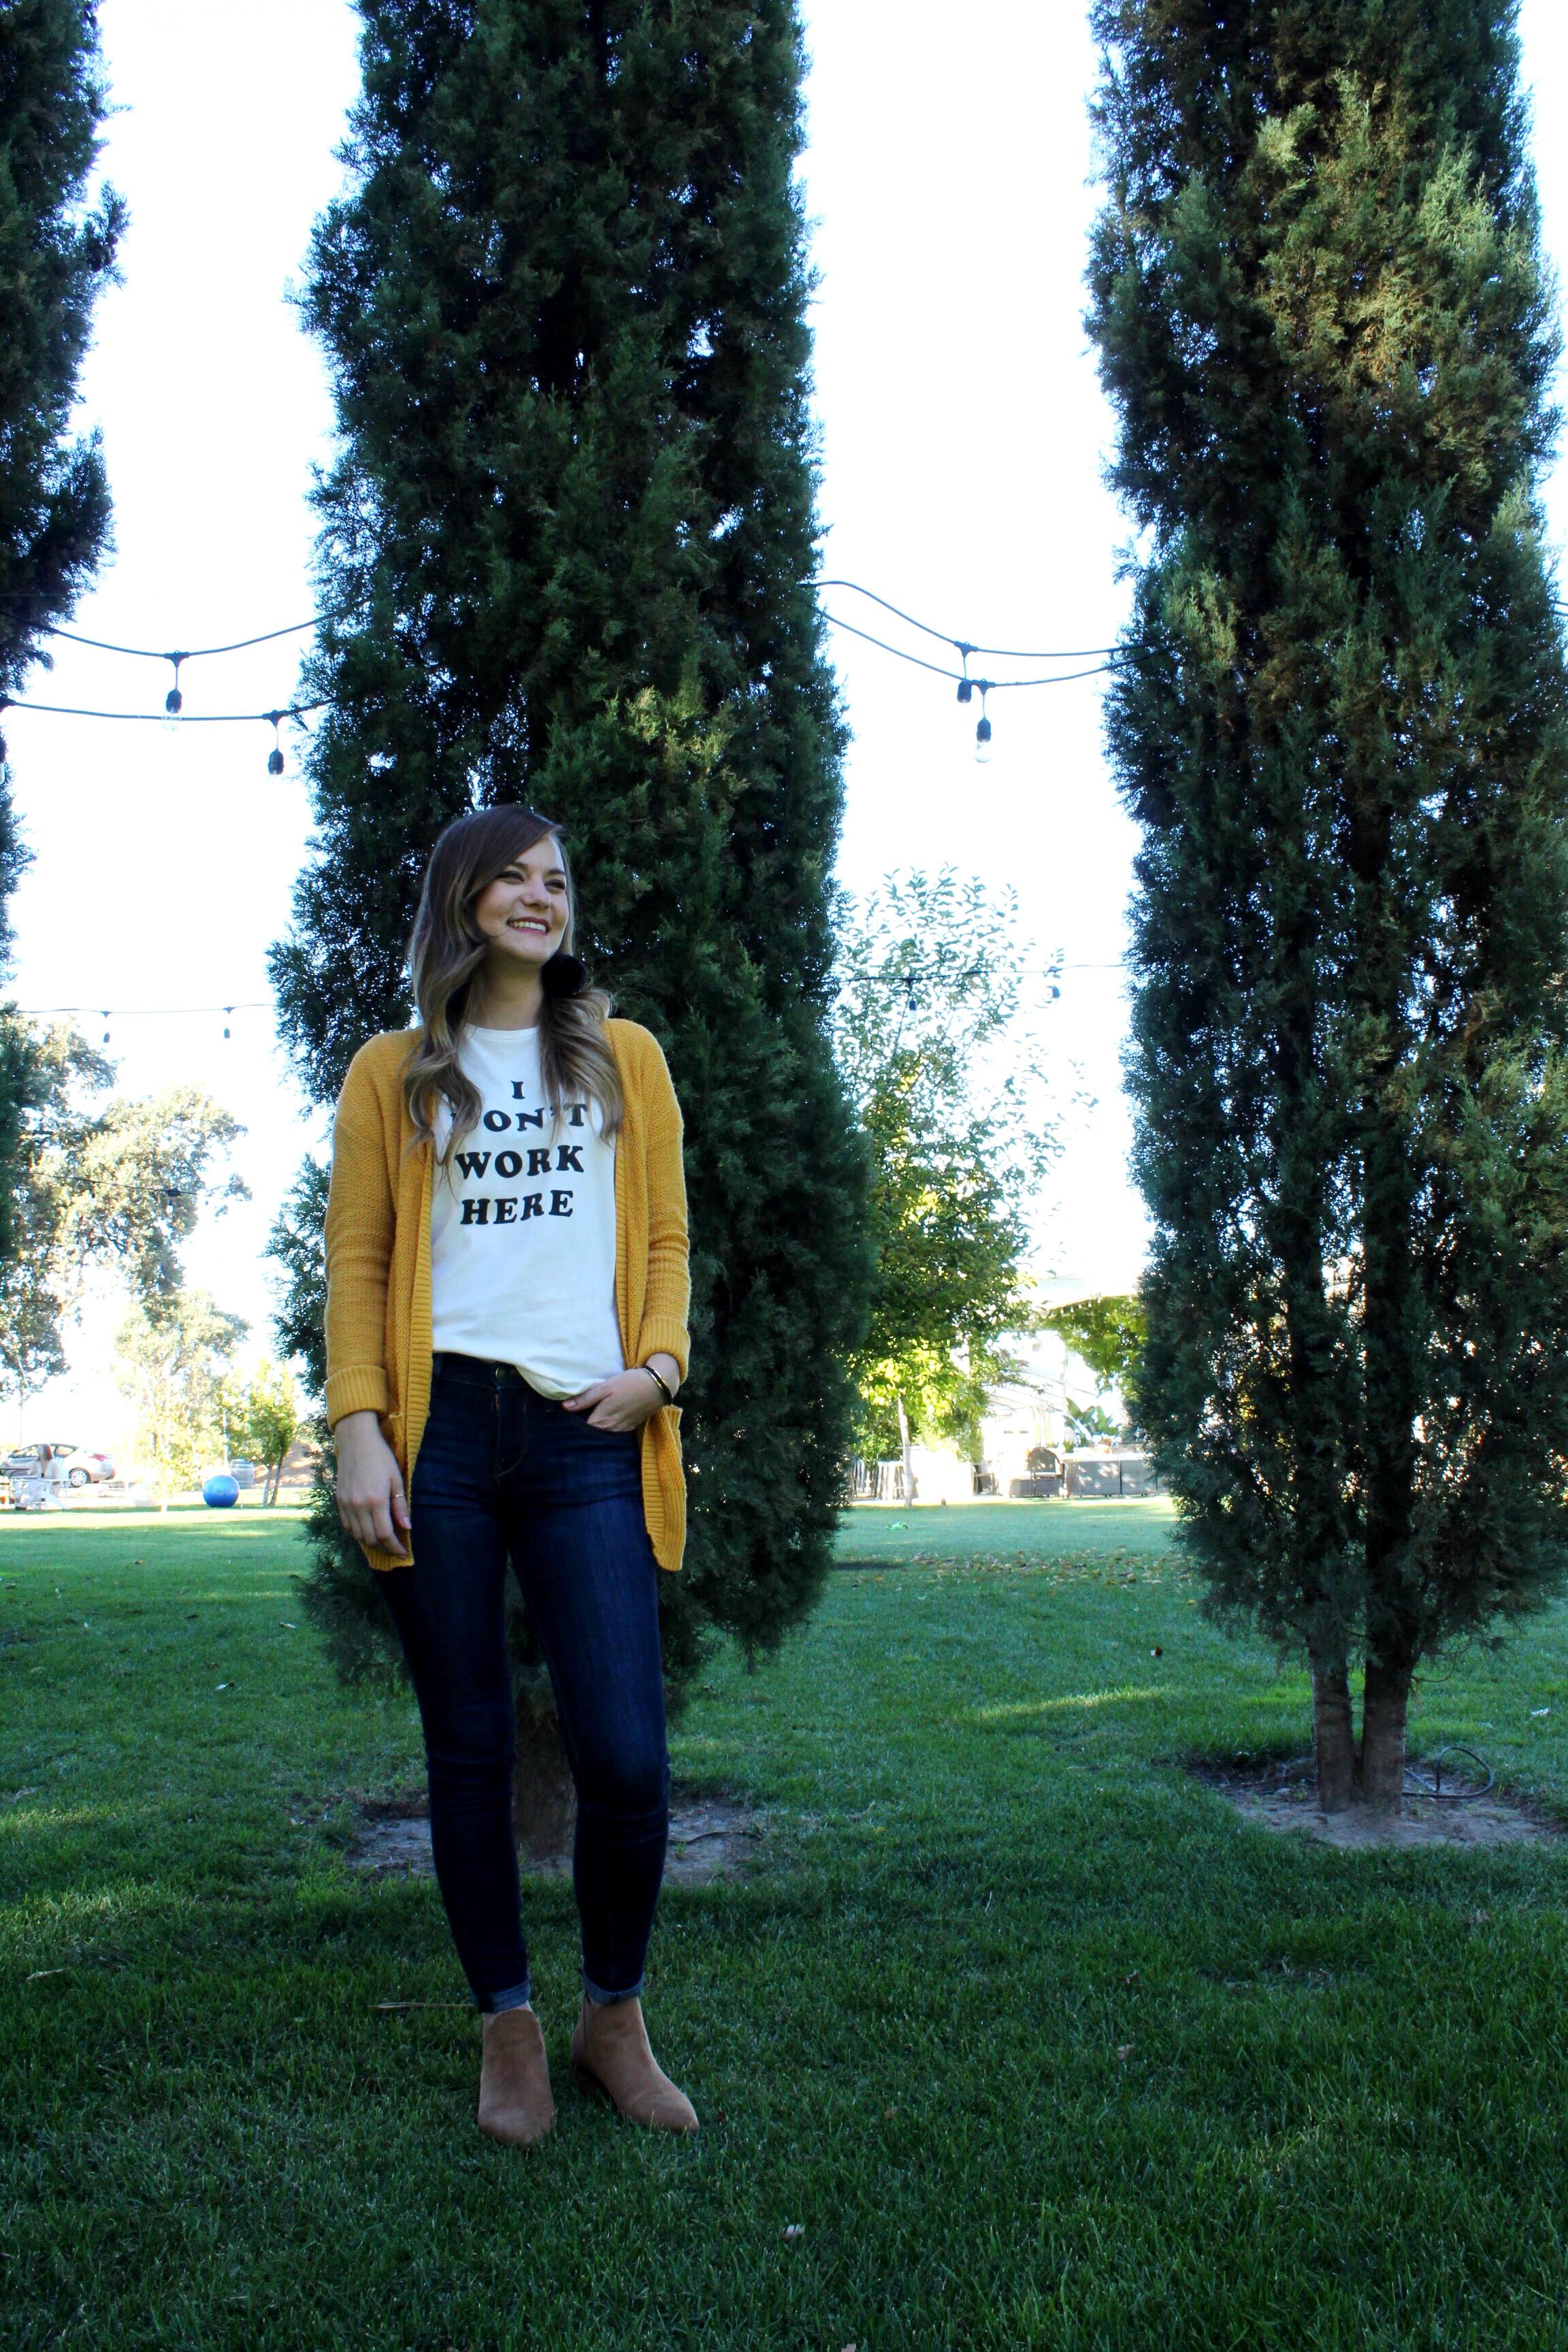 Bands Graphic Tee Shirt mustard yellow cardigan Lodi California Winery